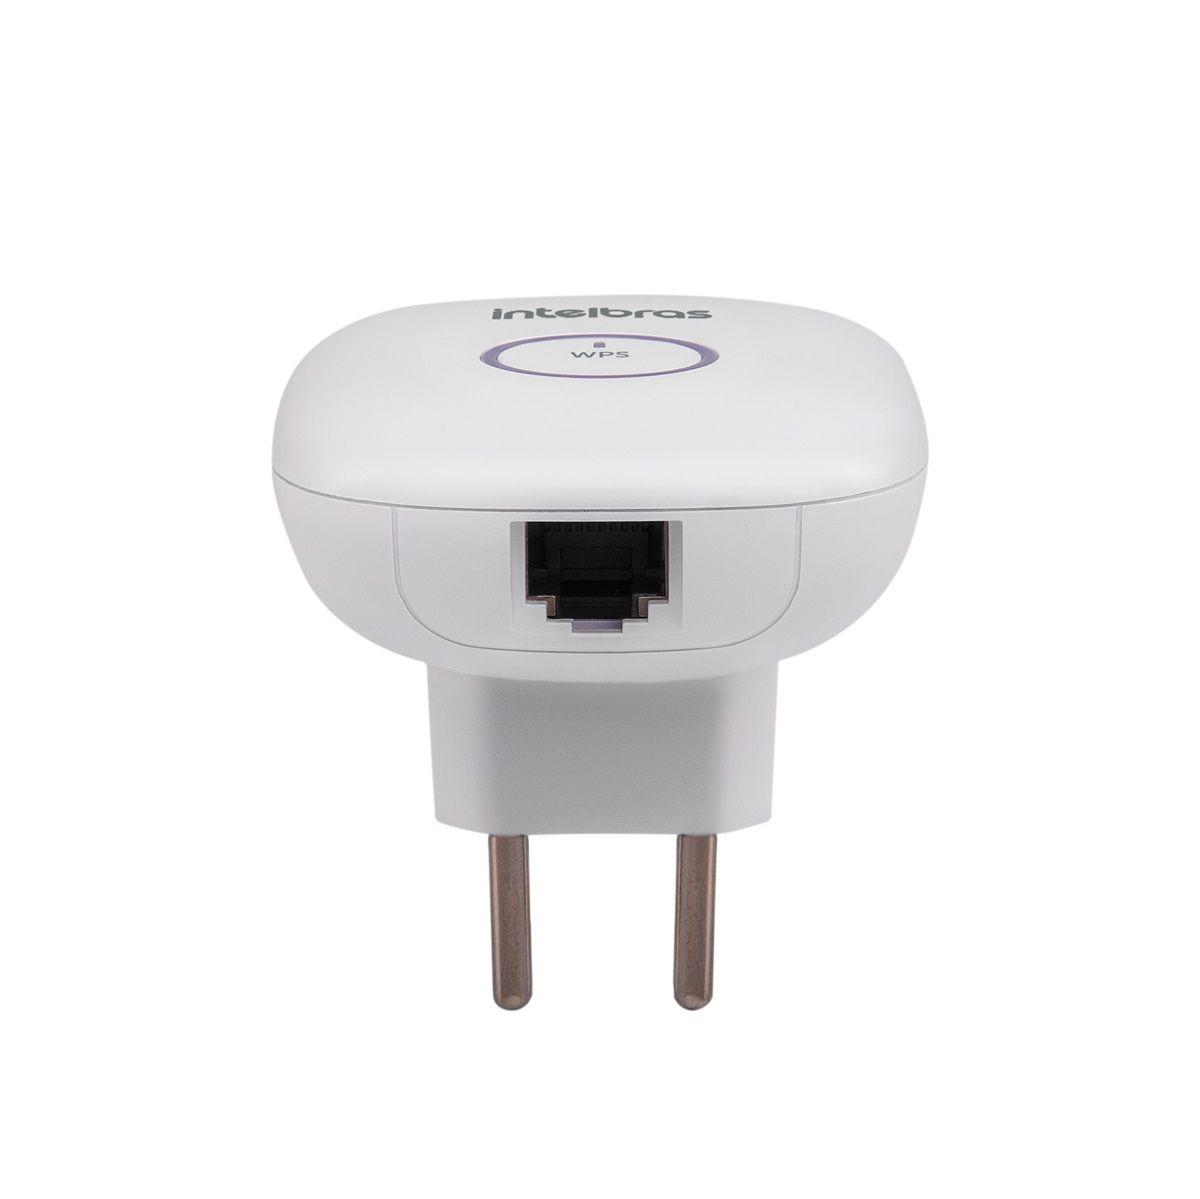 Repetidor Wi-Fi Intelbras IWE 3000N 300 Mbps